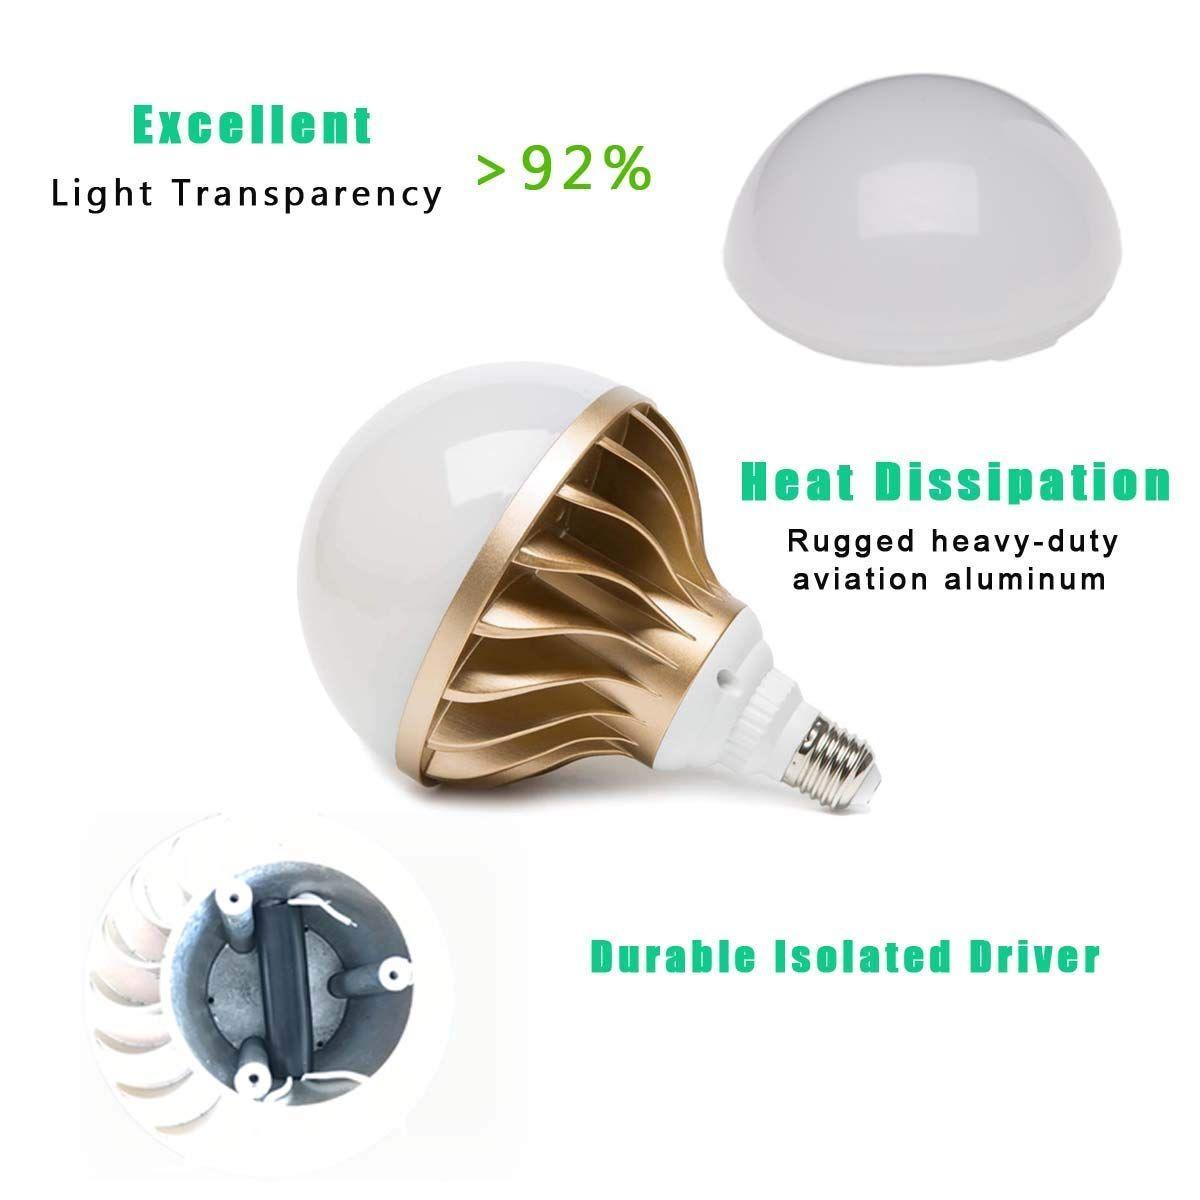 Led Light Bulb 300 Watt Equivalent Alddn 45w 4800 Lumens Daylight 5000k Non Dimmable Daylight Amazon Com Led Light Bulb Bulb Led Bulb